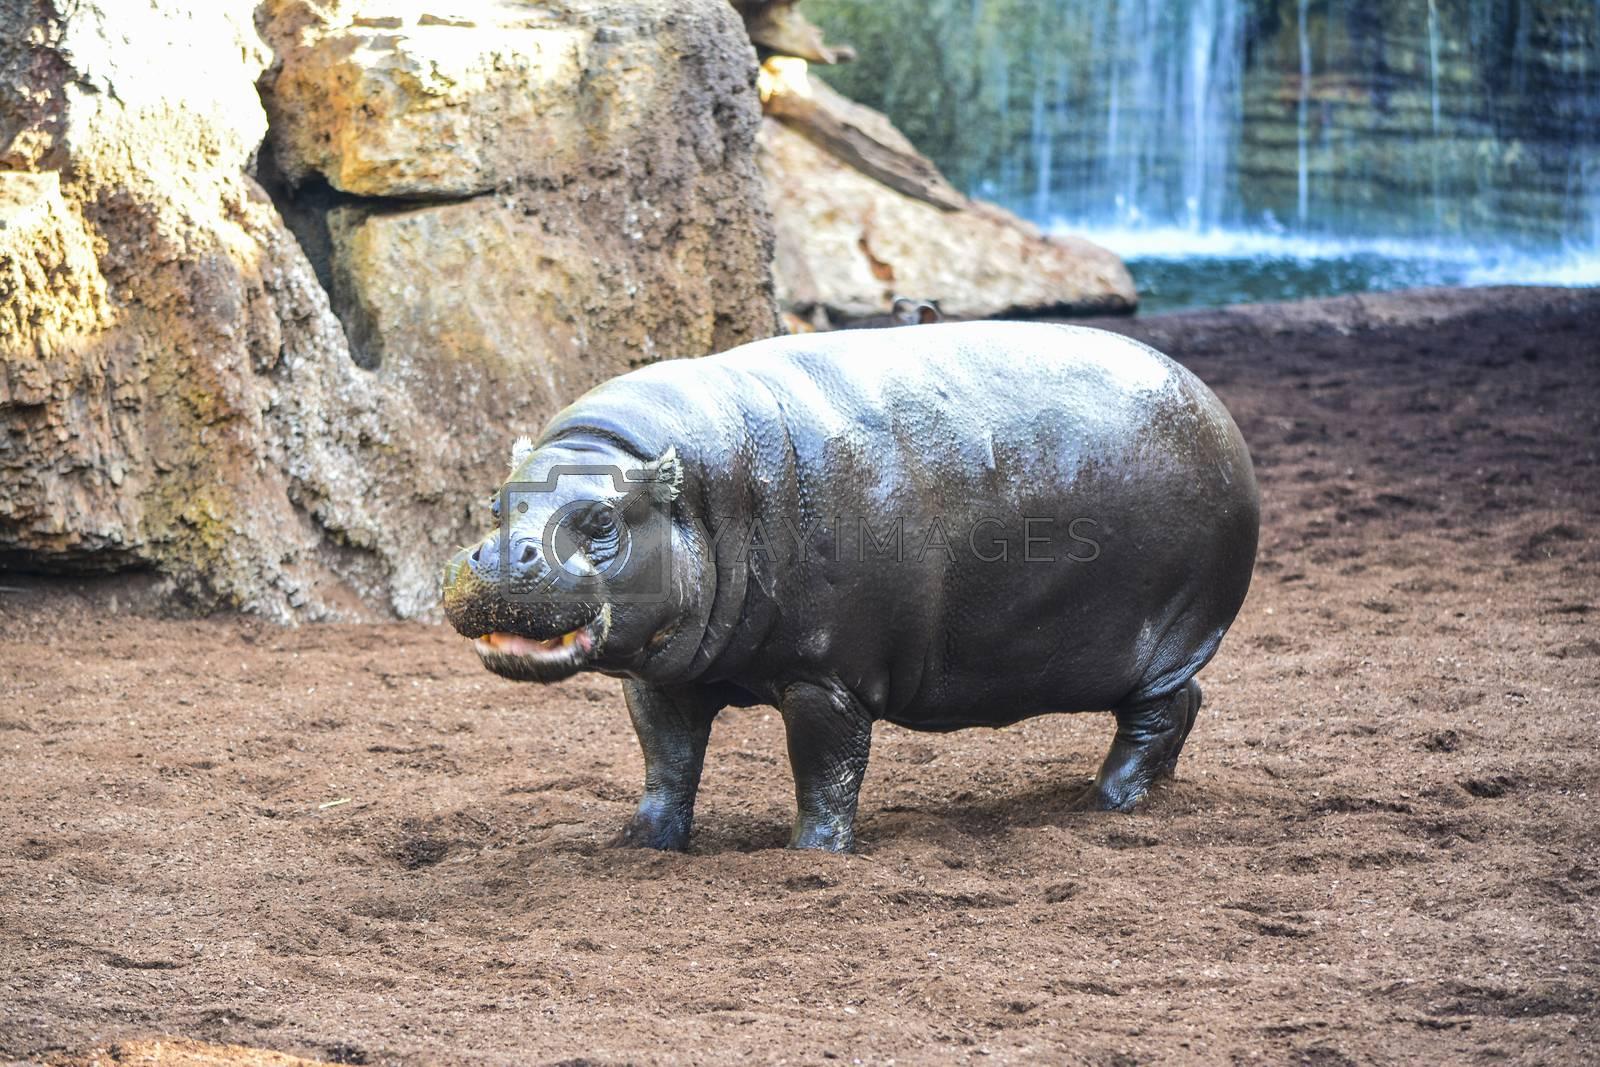 young hippopotamus portrait by Prf_photo